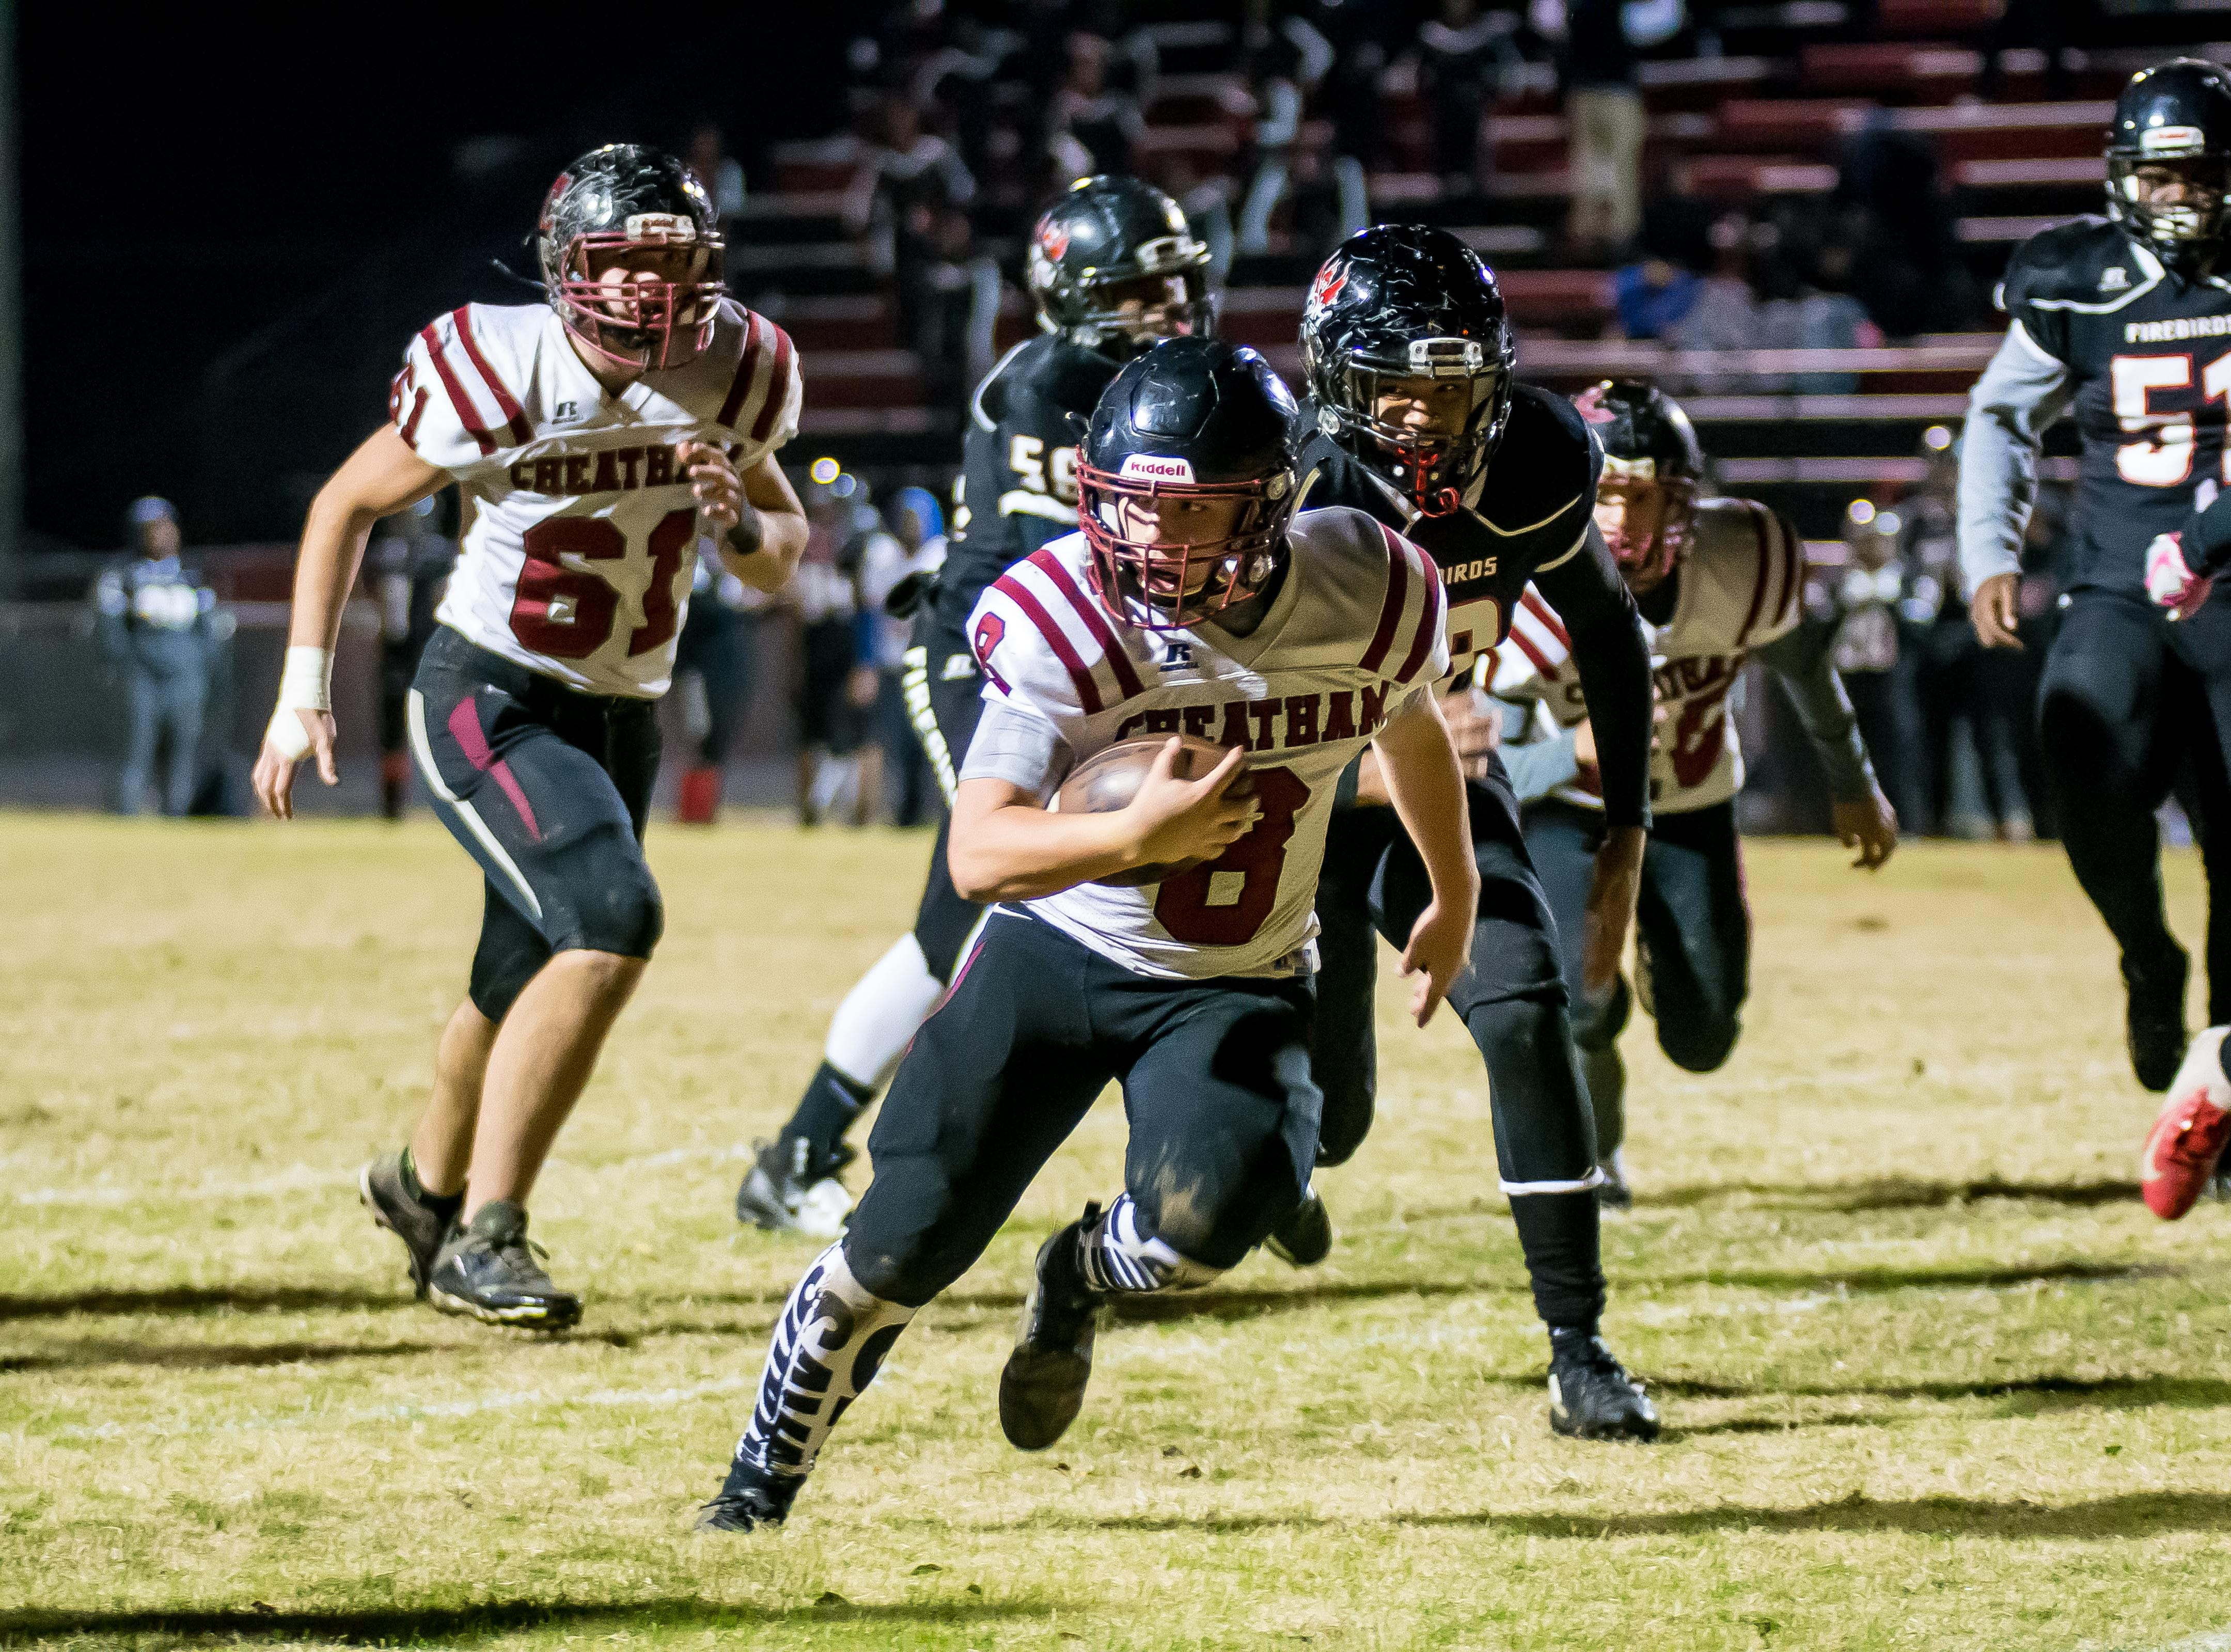 Cheatham County quarterback quarterback Bryson Entrikin scores a touchdown.